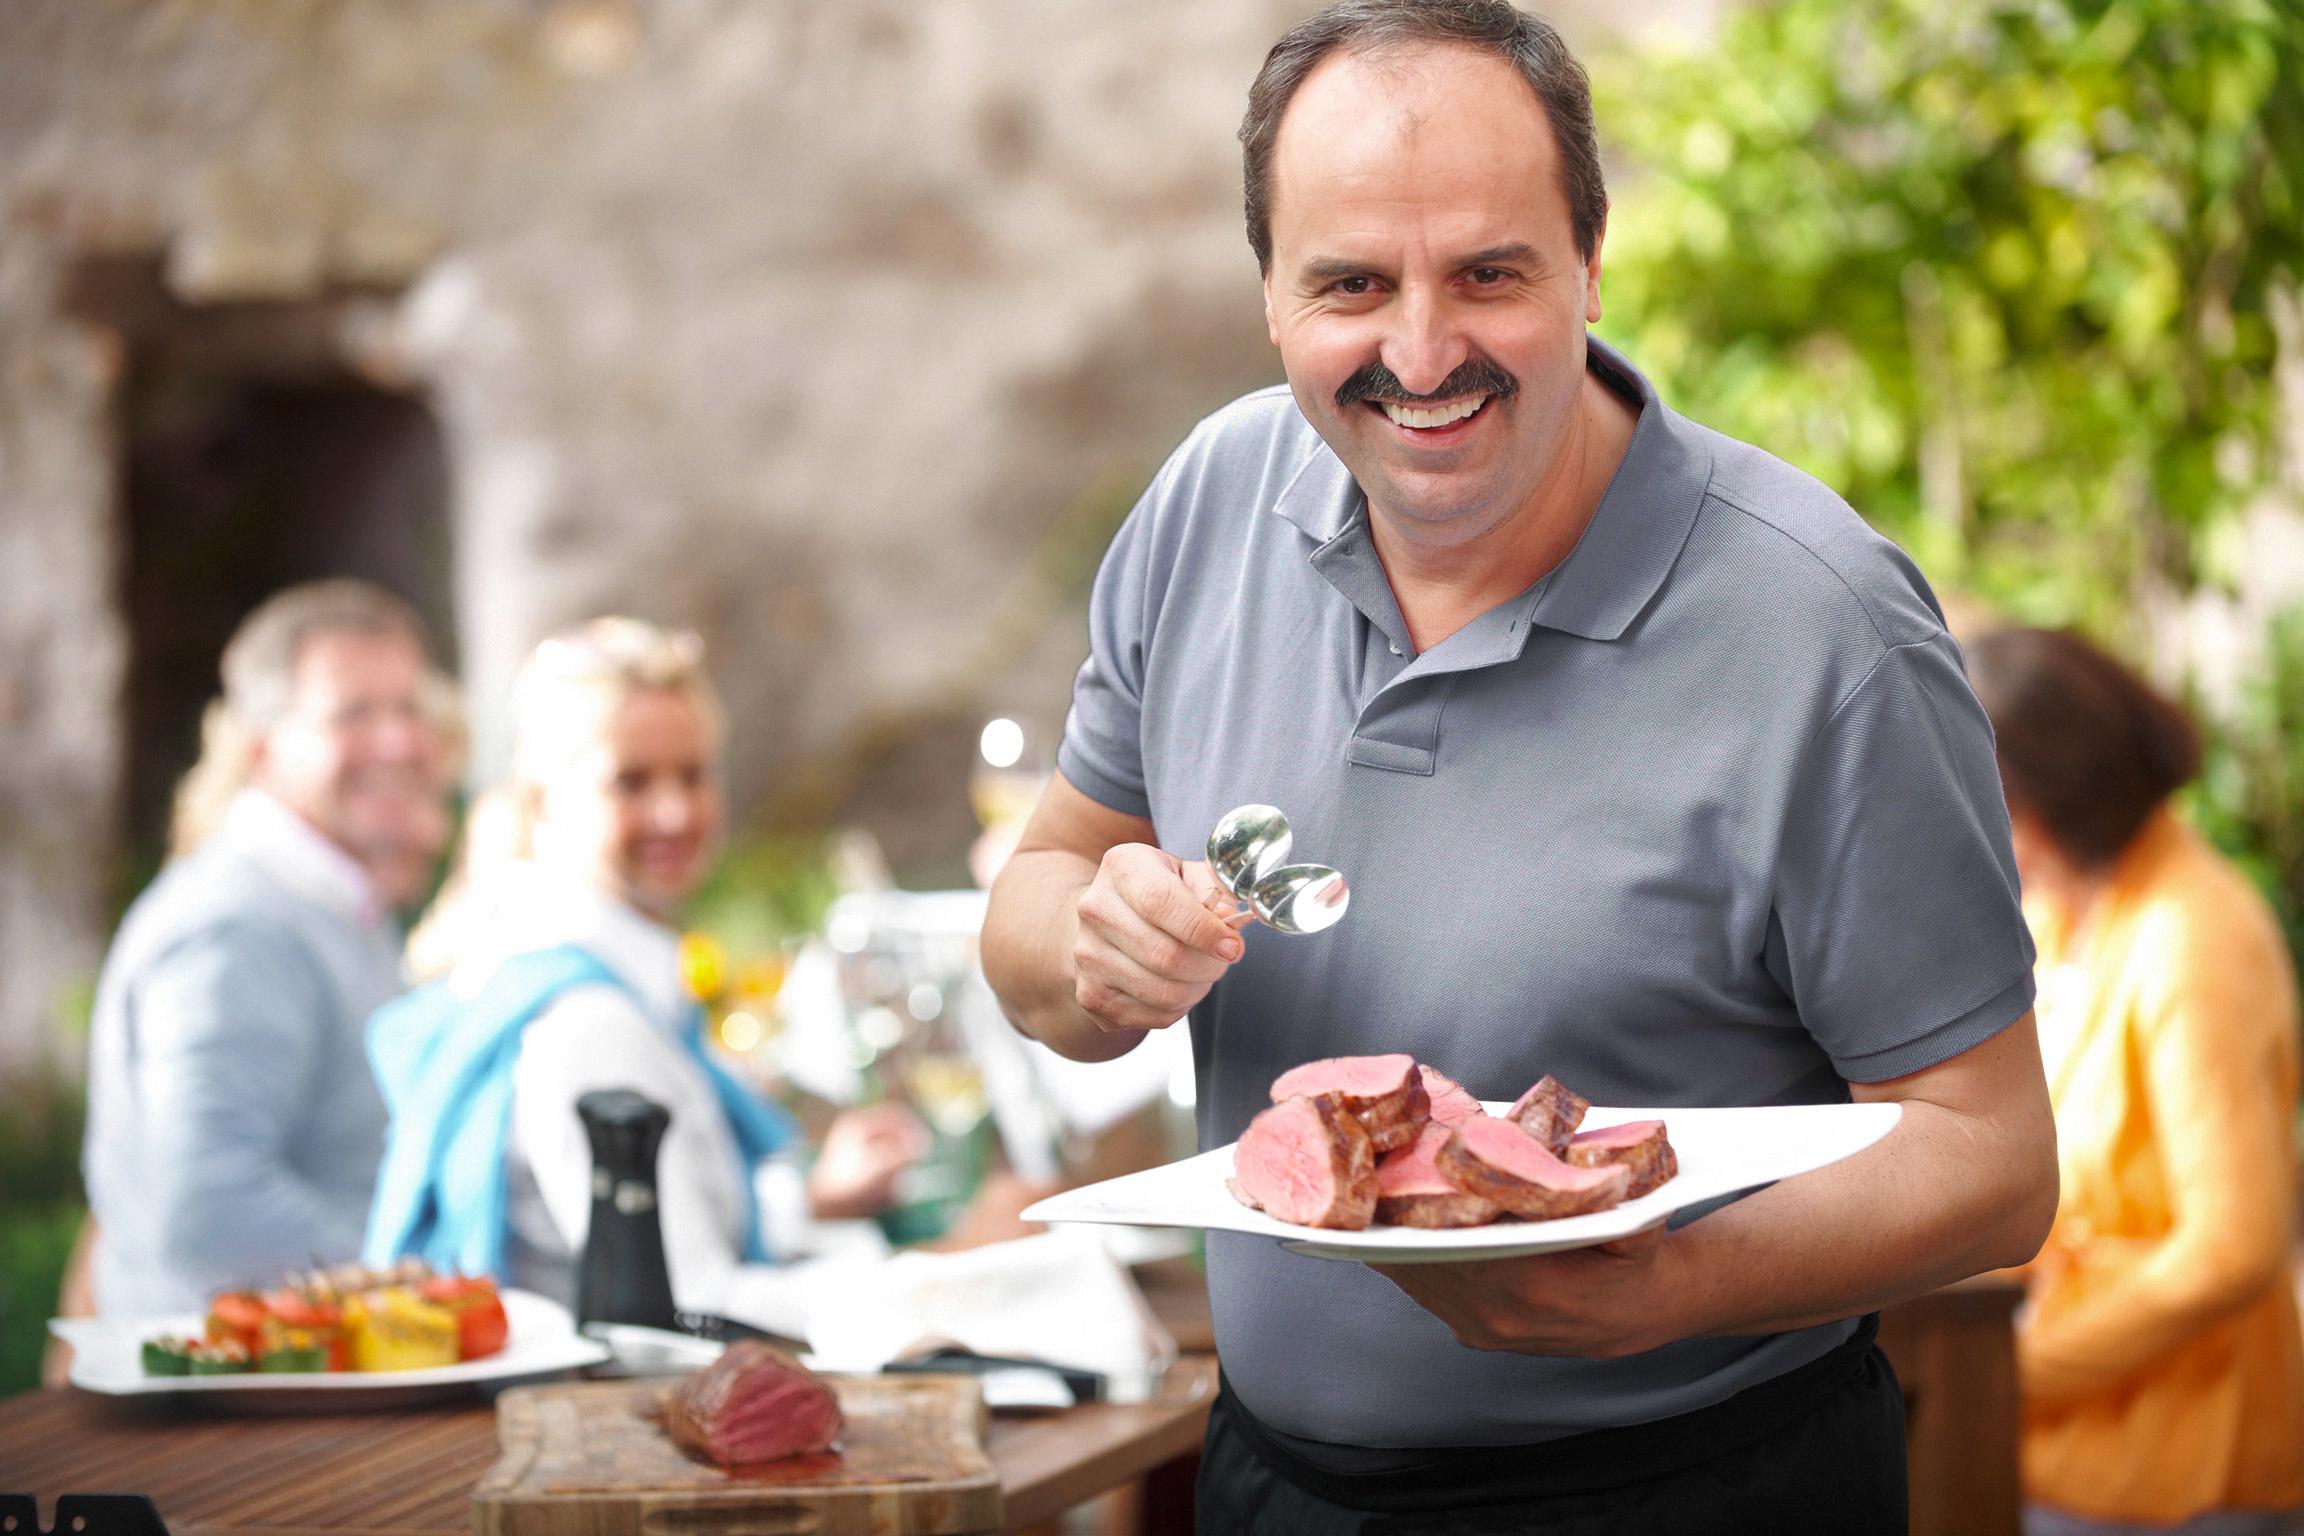 Weber Holzkohlegrill Johann Lafer Edition : Weber grill promotion mit johann lafer berndgrundmann